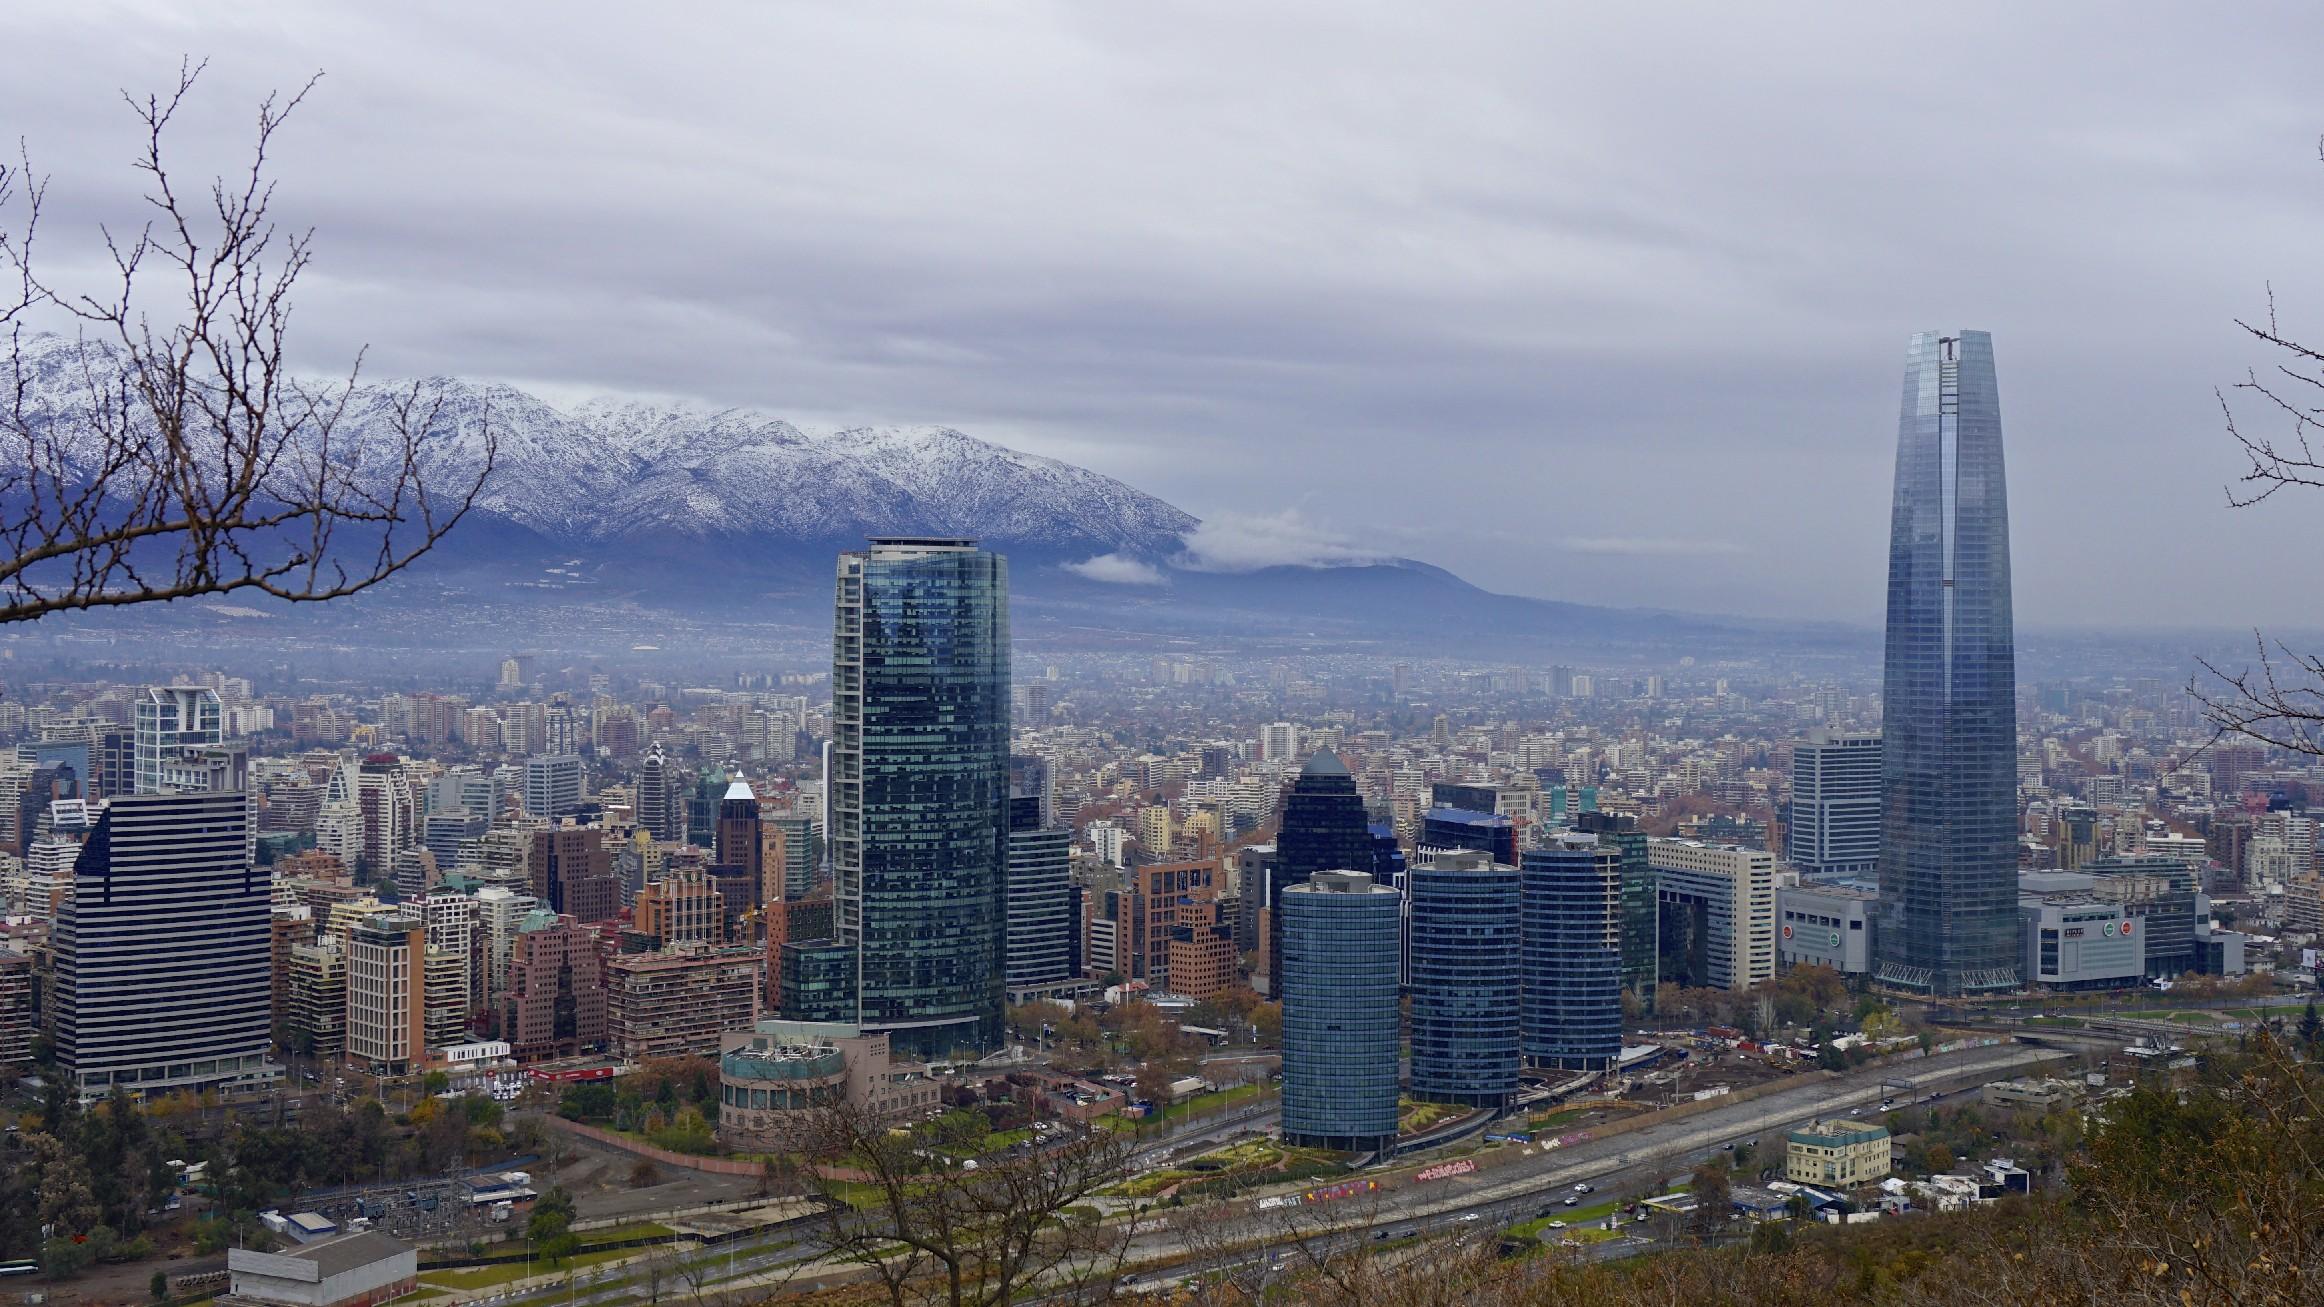 Vista de Santiago, capital do Chile (foto: alobos Life /Flickr Creative Commons)